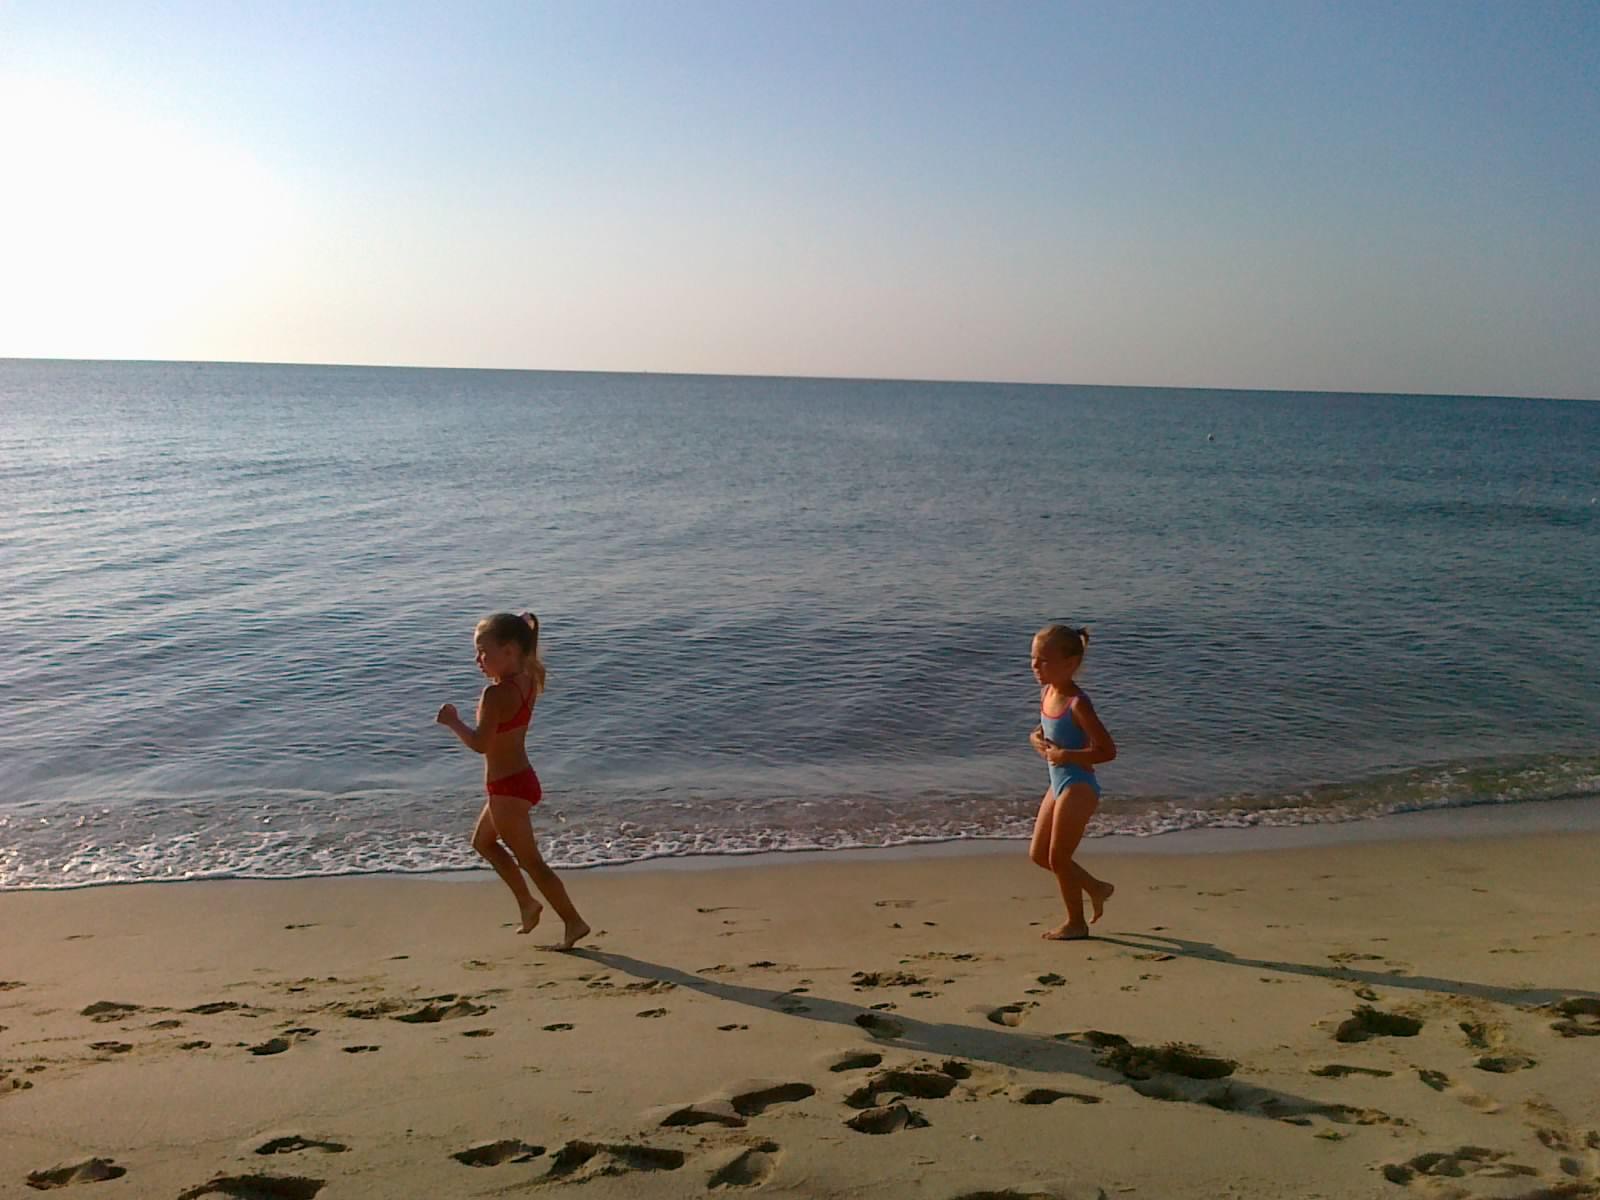 Утренняя тренировка на пляже. Моя тренировка